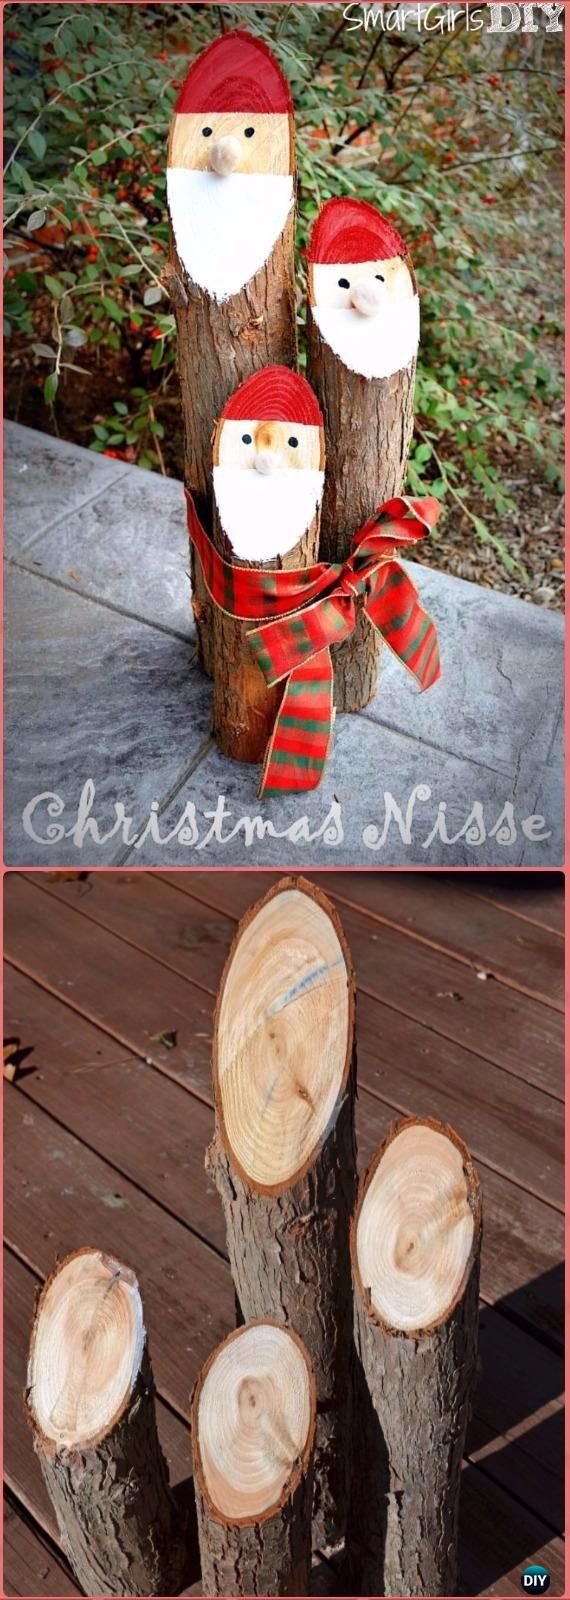 DIY Christmas Santa Log Decoration Instructions - Raw Wood Logs and Stumps DIY Ideas Projects